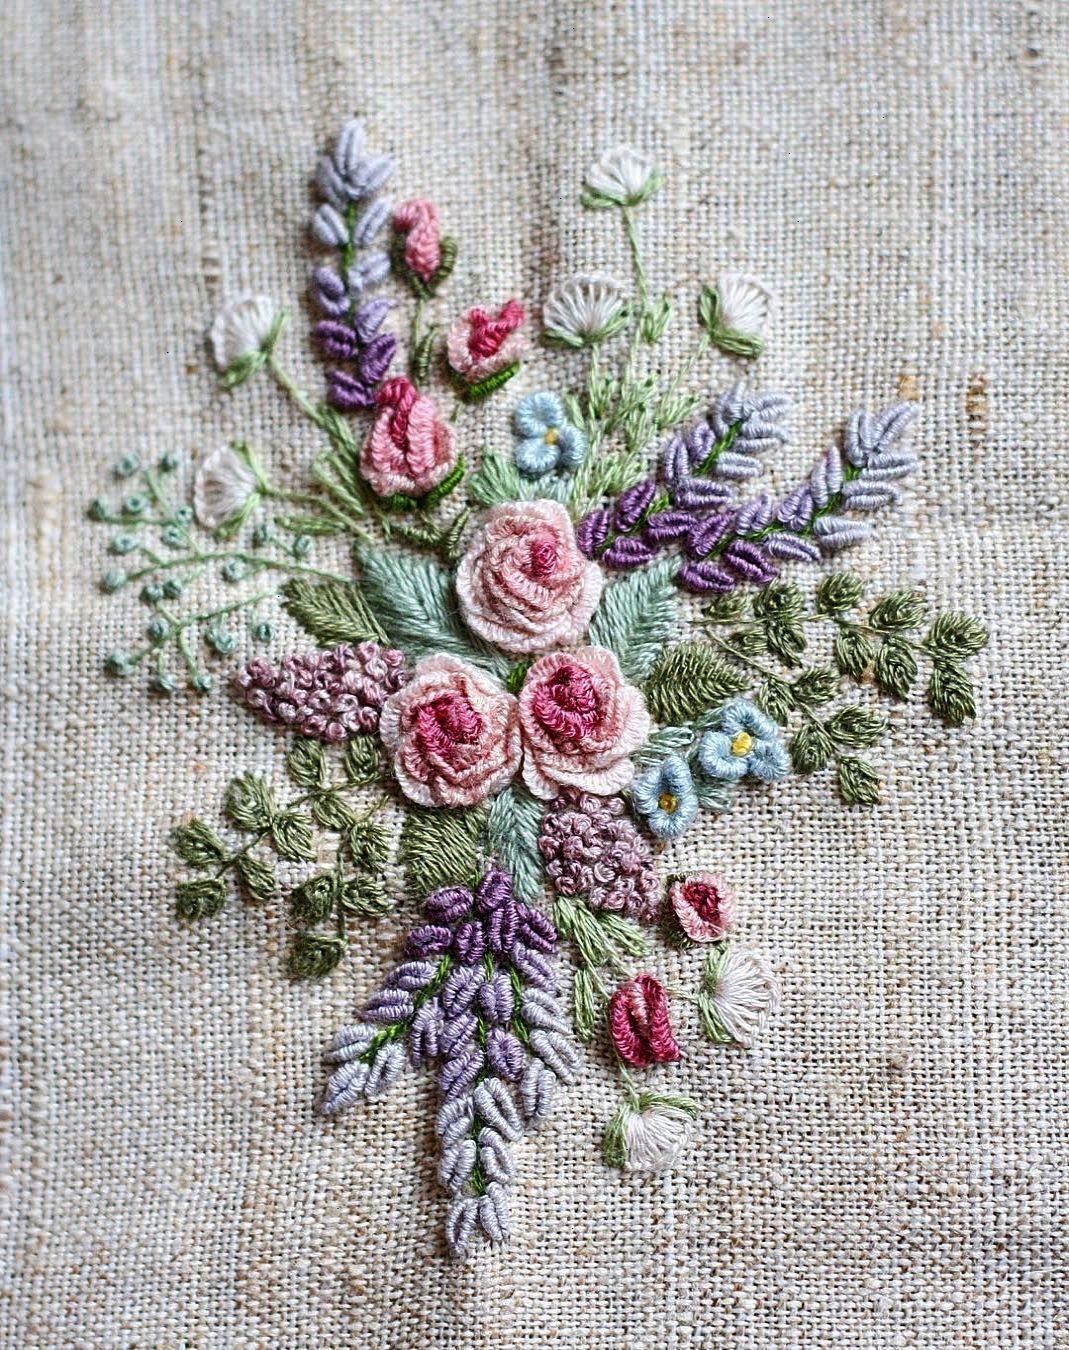 Calla Lily - DK Designs Brazilian Embroidery pattern & fabric #3892 | Ribbon embroidery ...